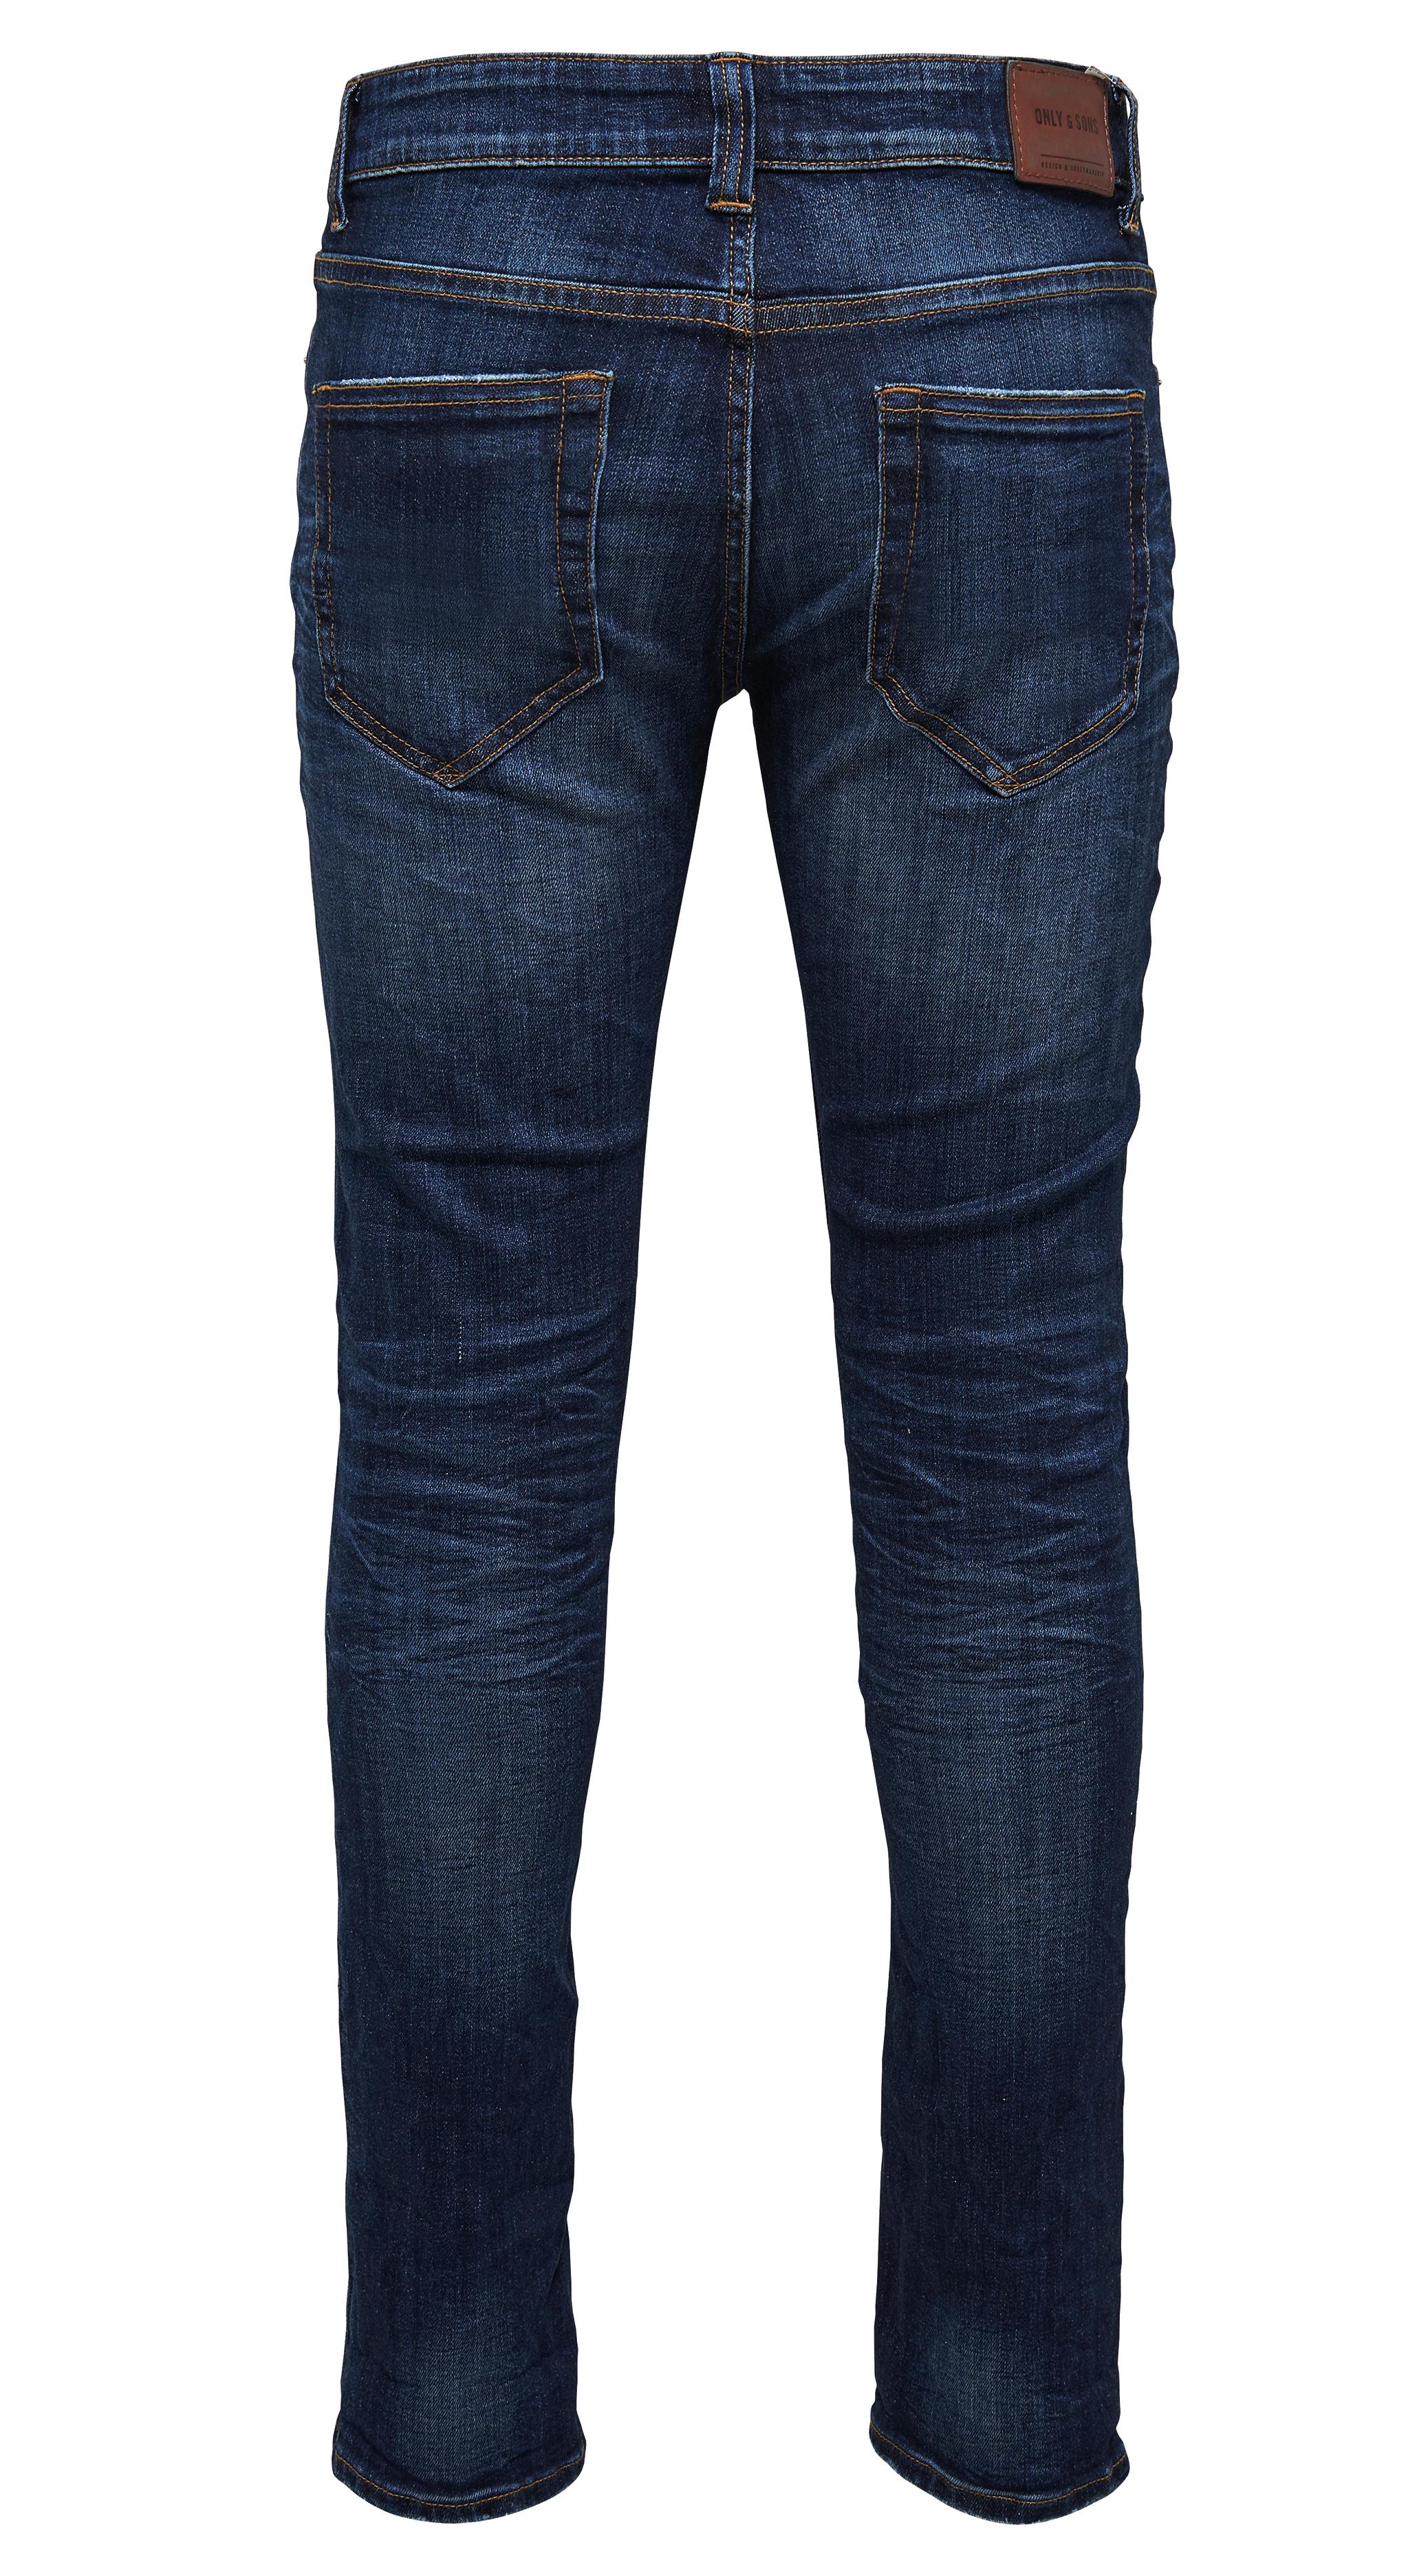 ONLY /& SONS Jeans New Mens Loom Slim Fit Narrow Leg Denim Pants Dark Blue Faded